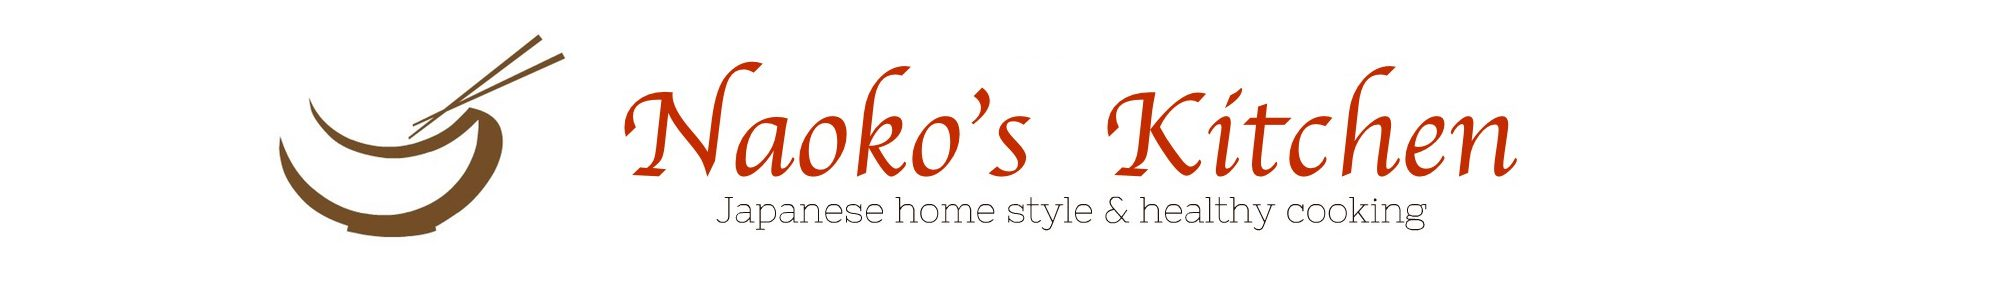 Naoko's Kitchen – Attic